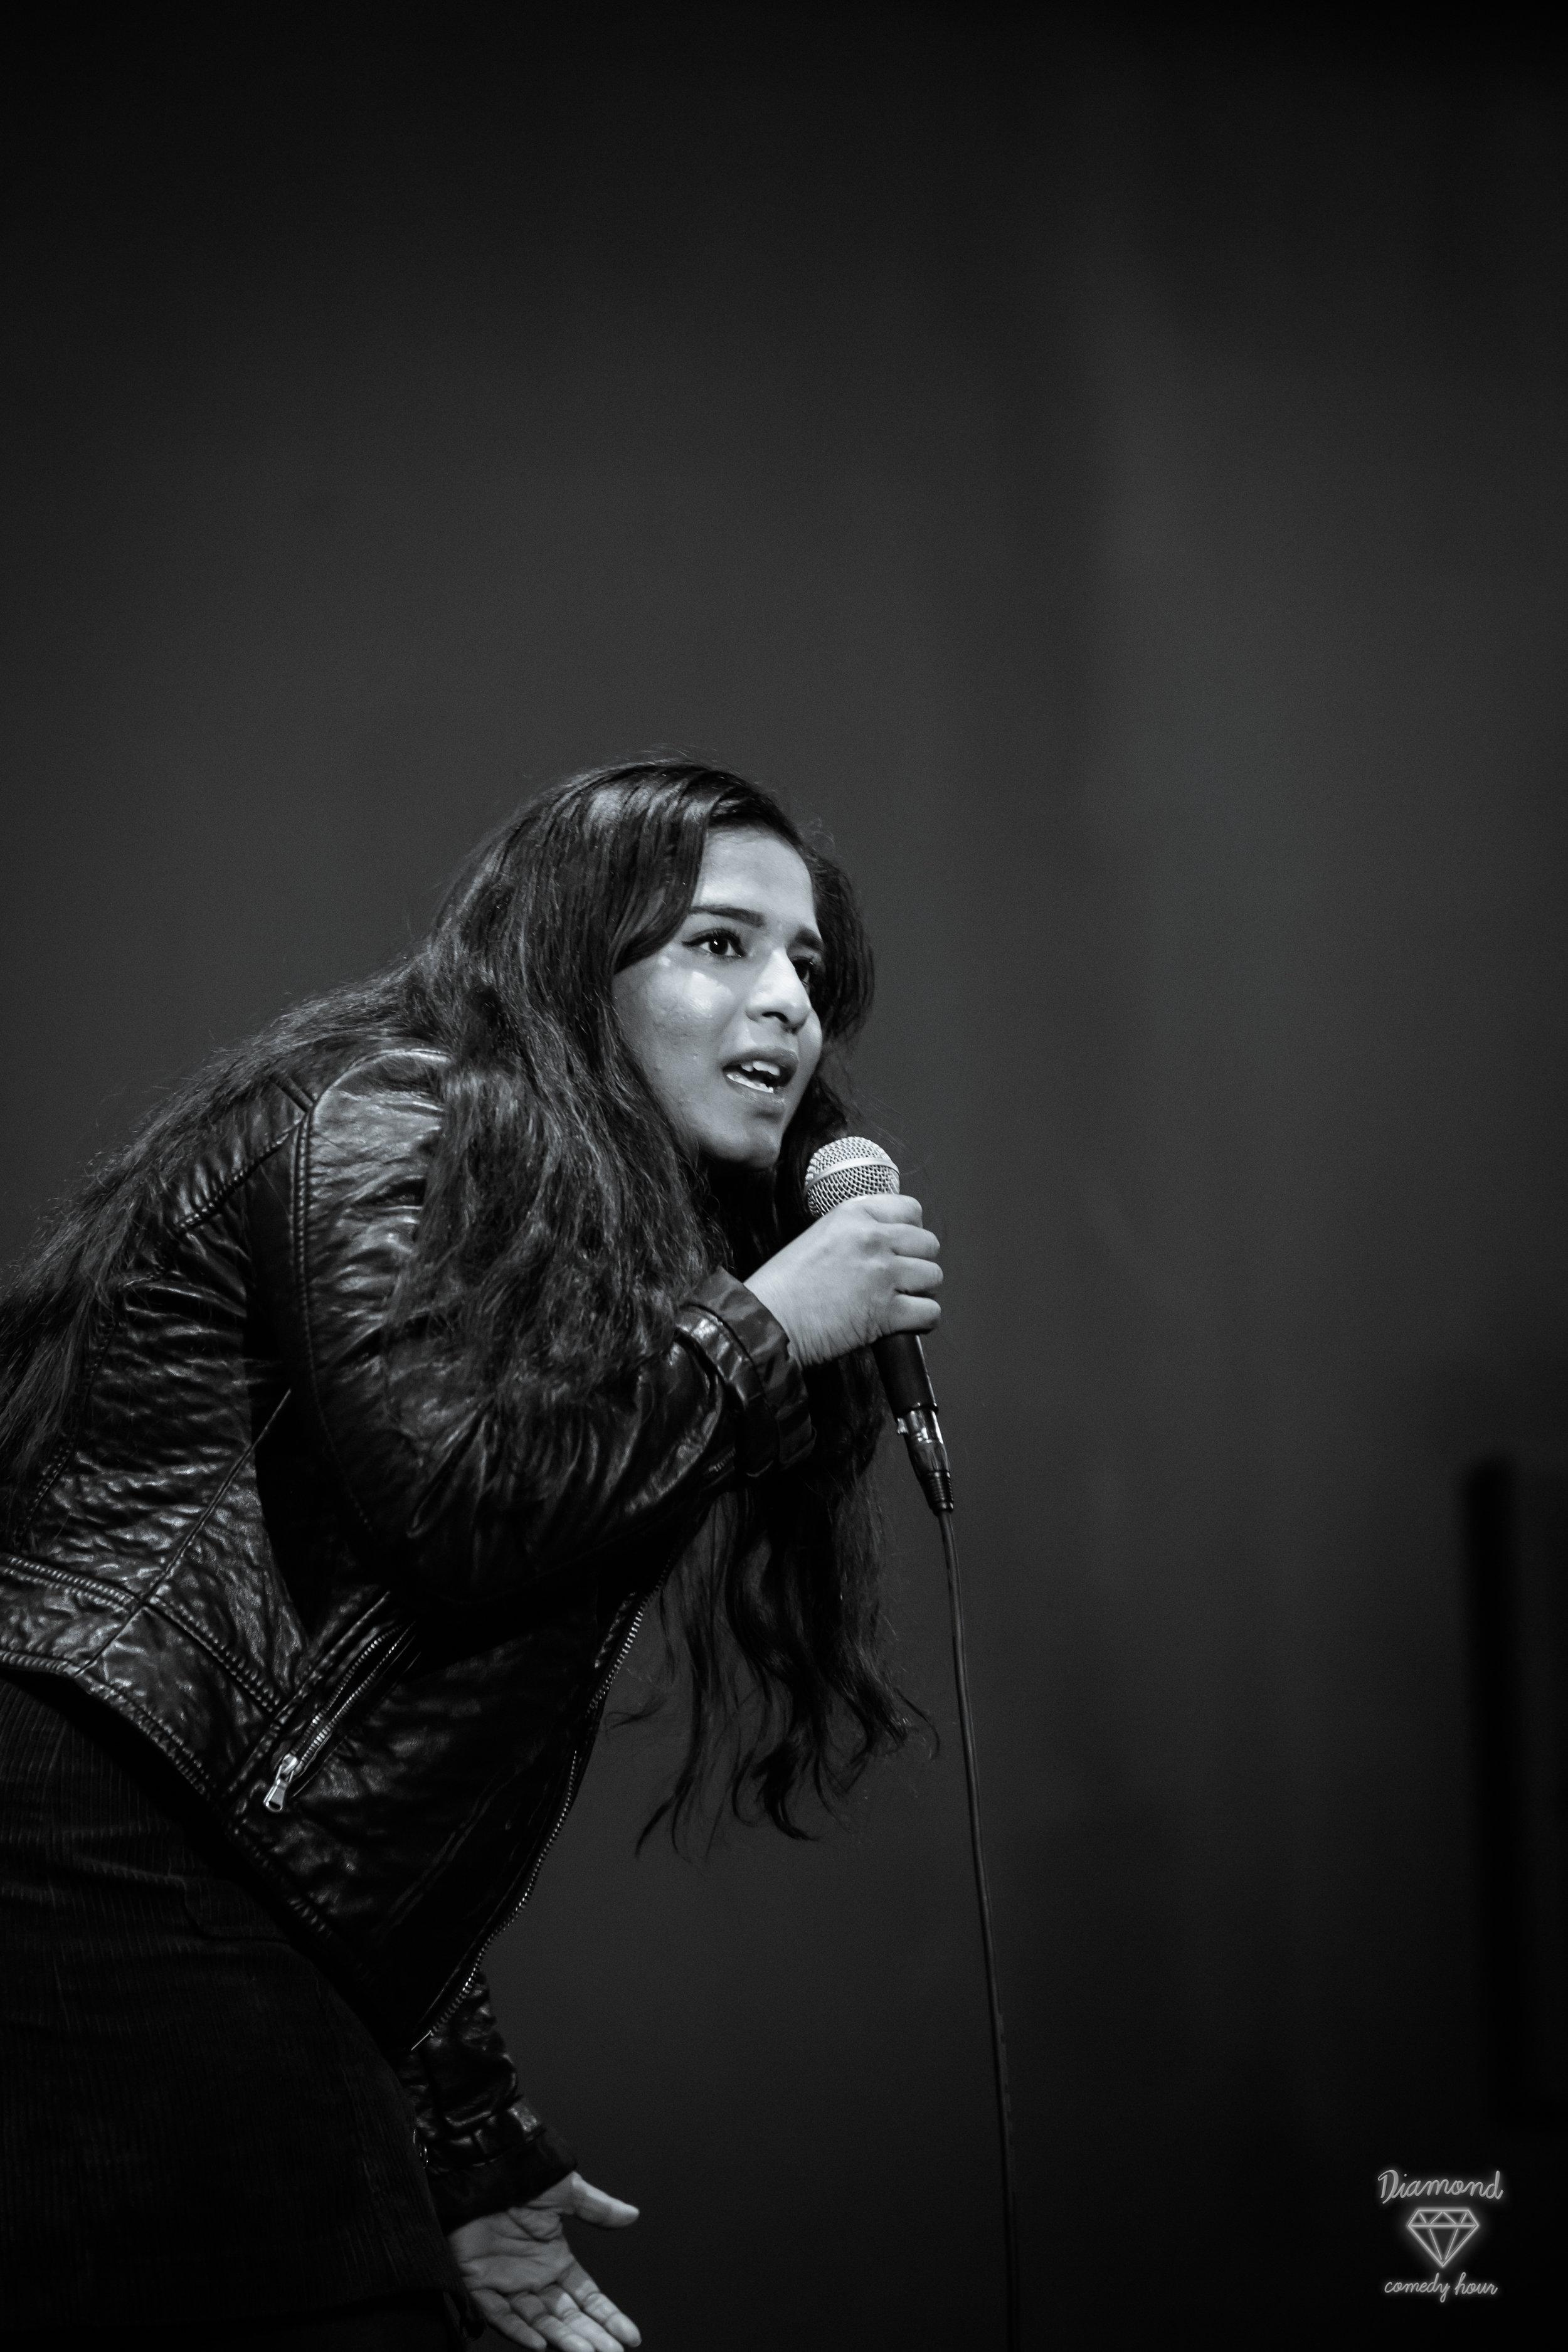 Meg indurti - comedian ; writer